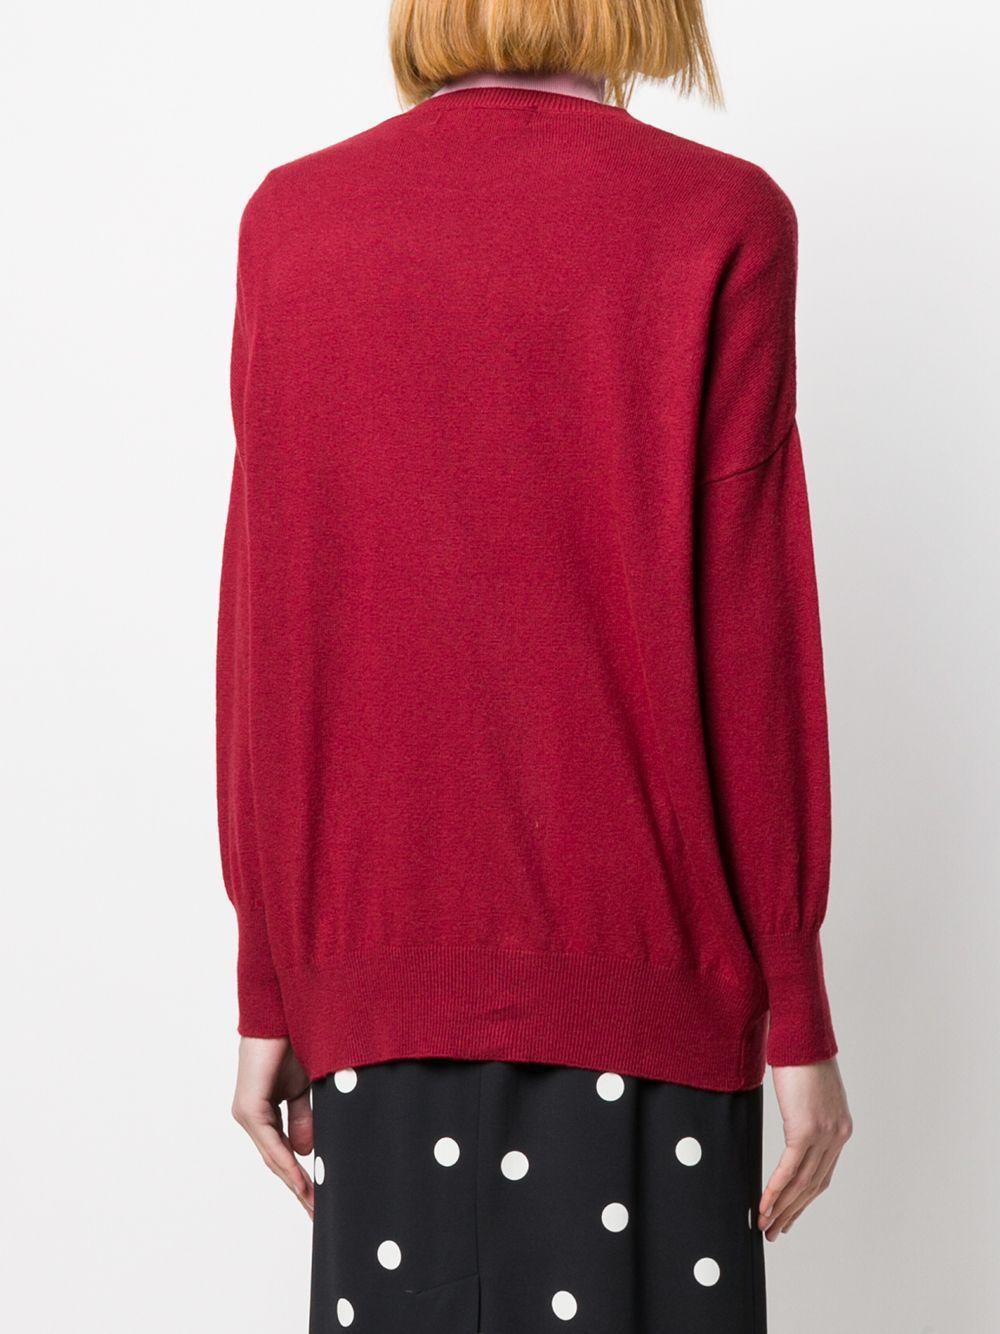 Jersey de punto fino Guardaroba de Lana de color Rojo